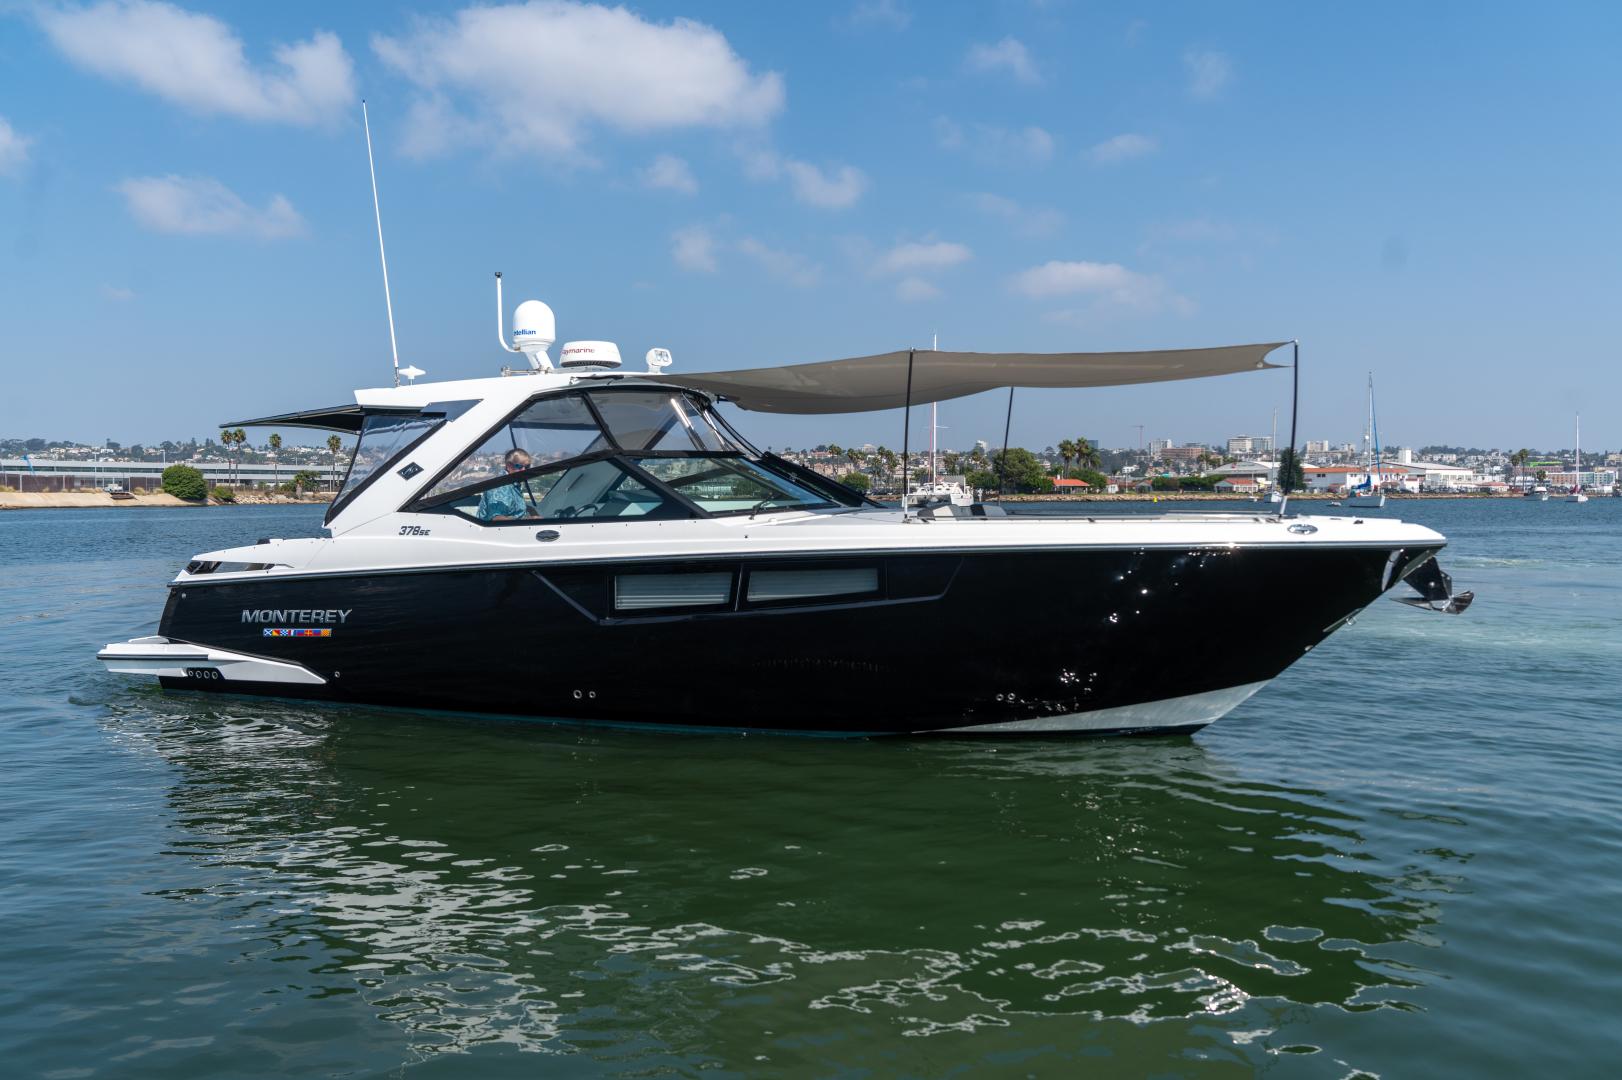 Monterey-378SE 2019-MATONE IV California-United States-EXTERIOR-1511159   Thumbnail